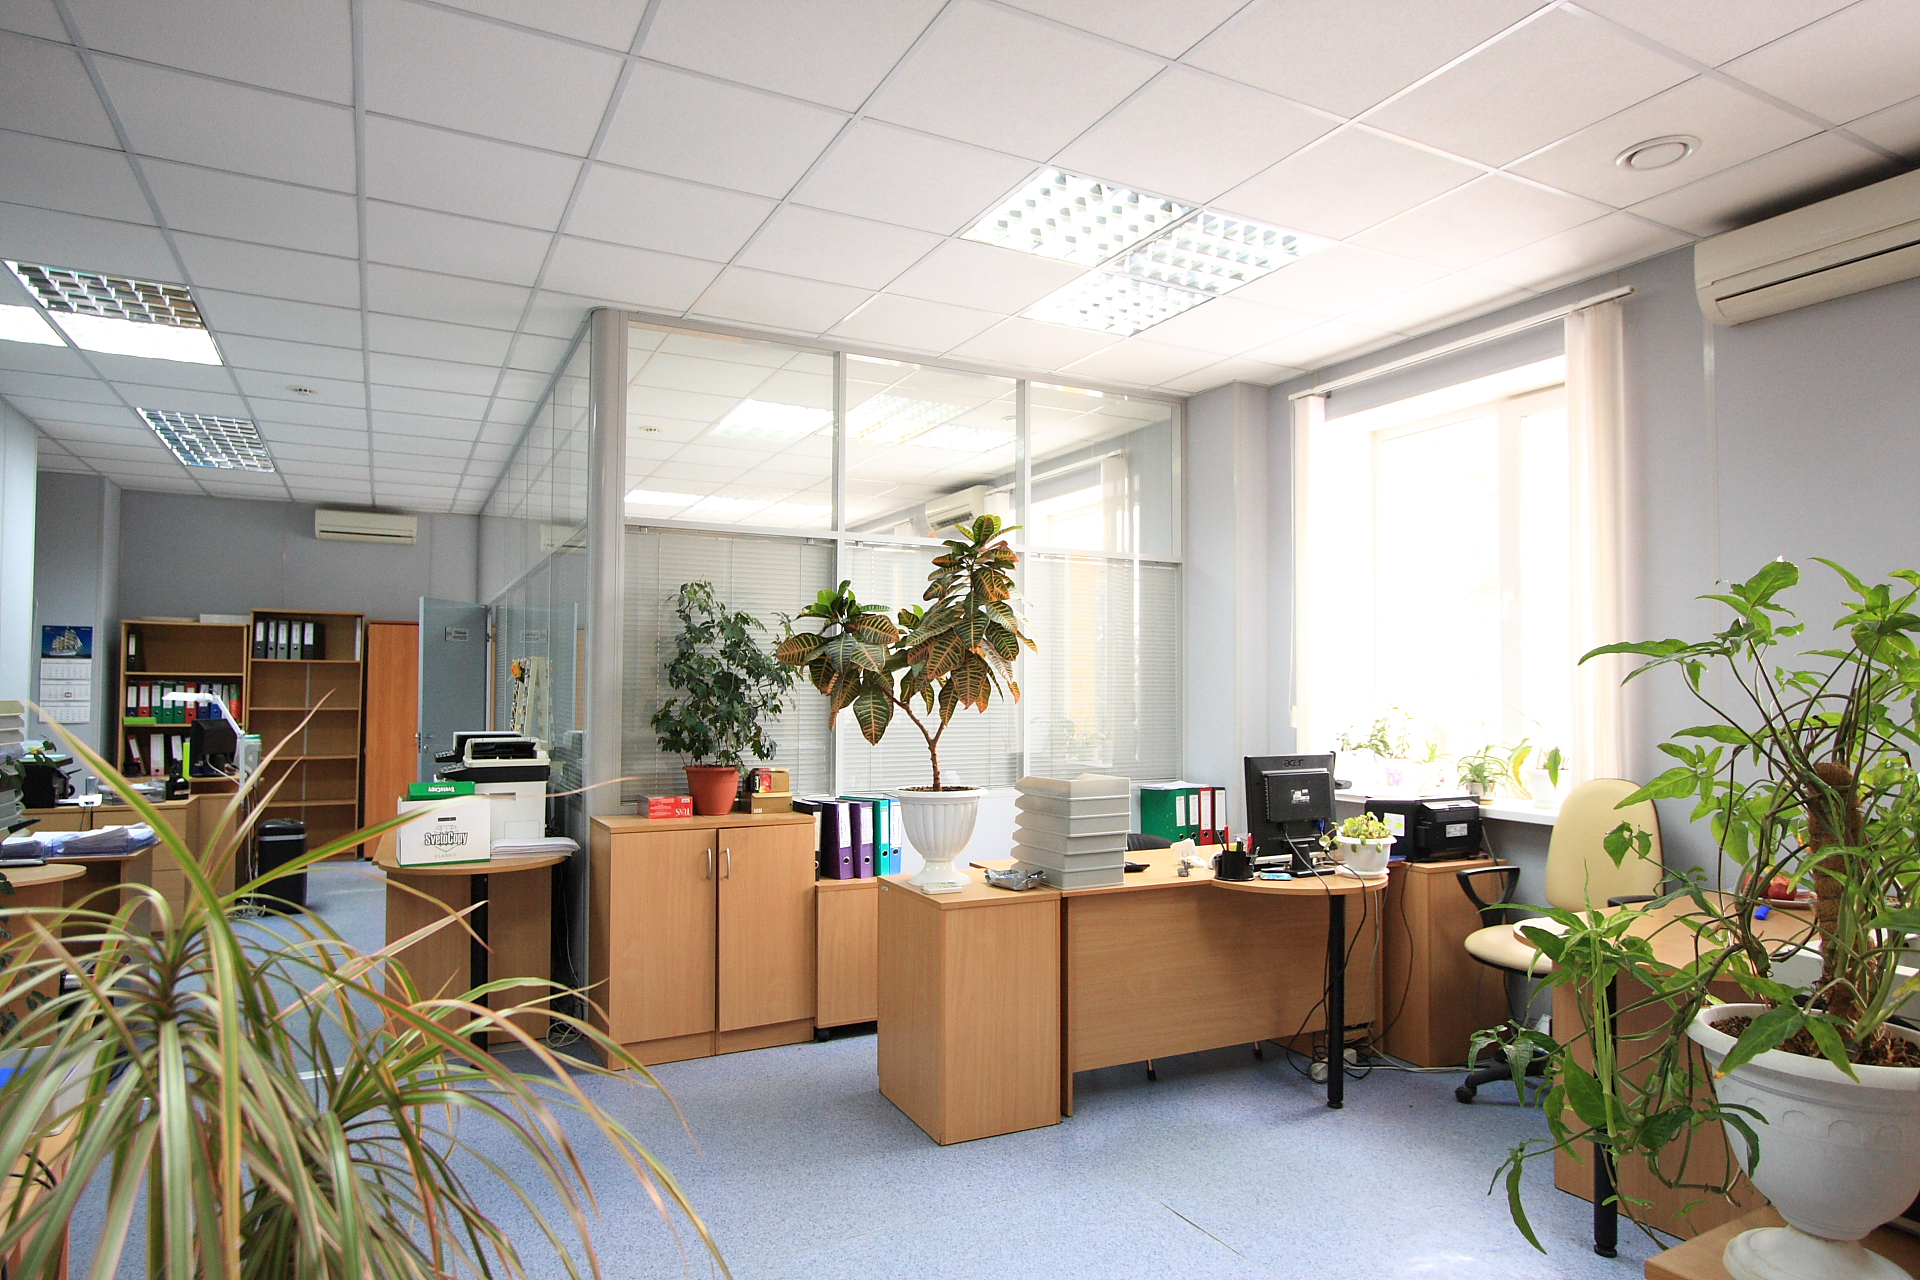 аренда офисов екатеринбург с фотографиями